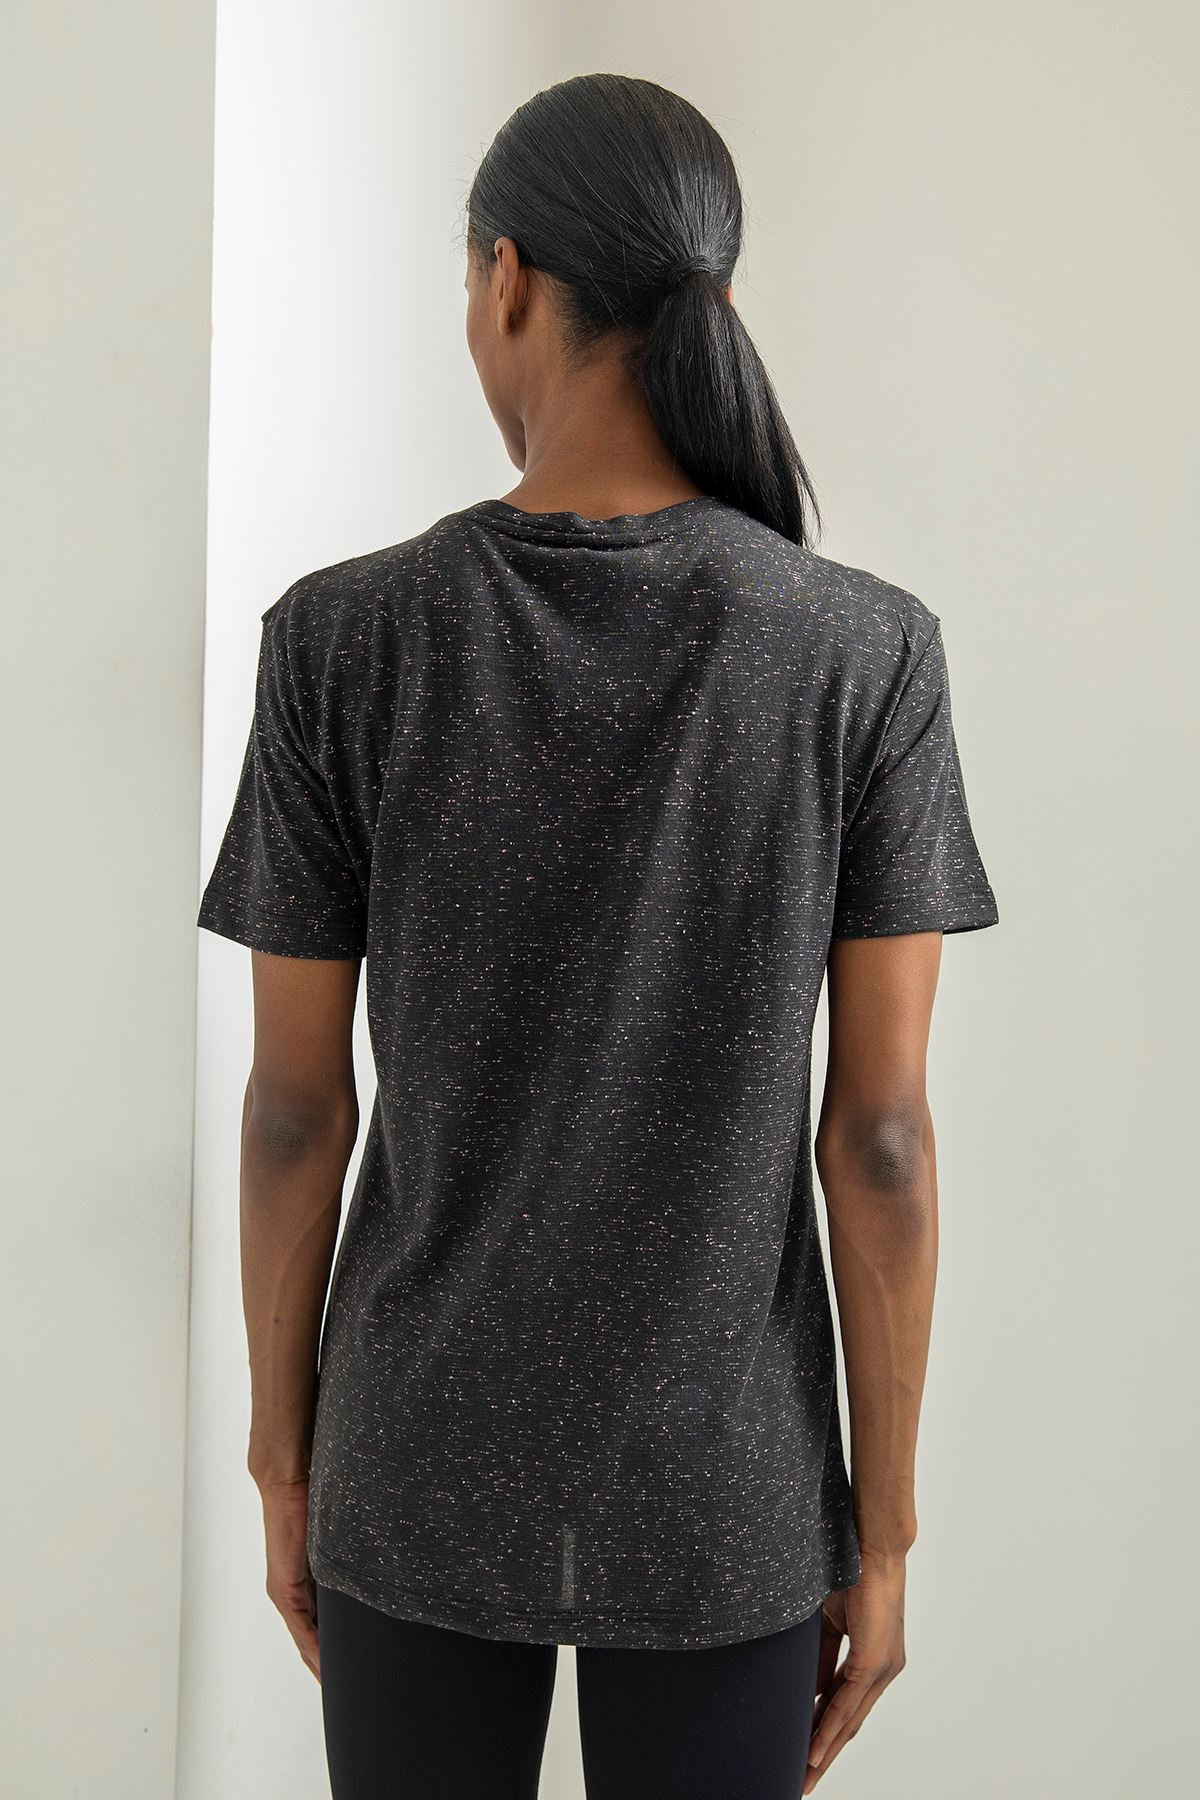 Tropical Mood Baskılı T-shirt-Siyah